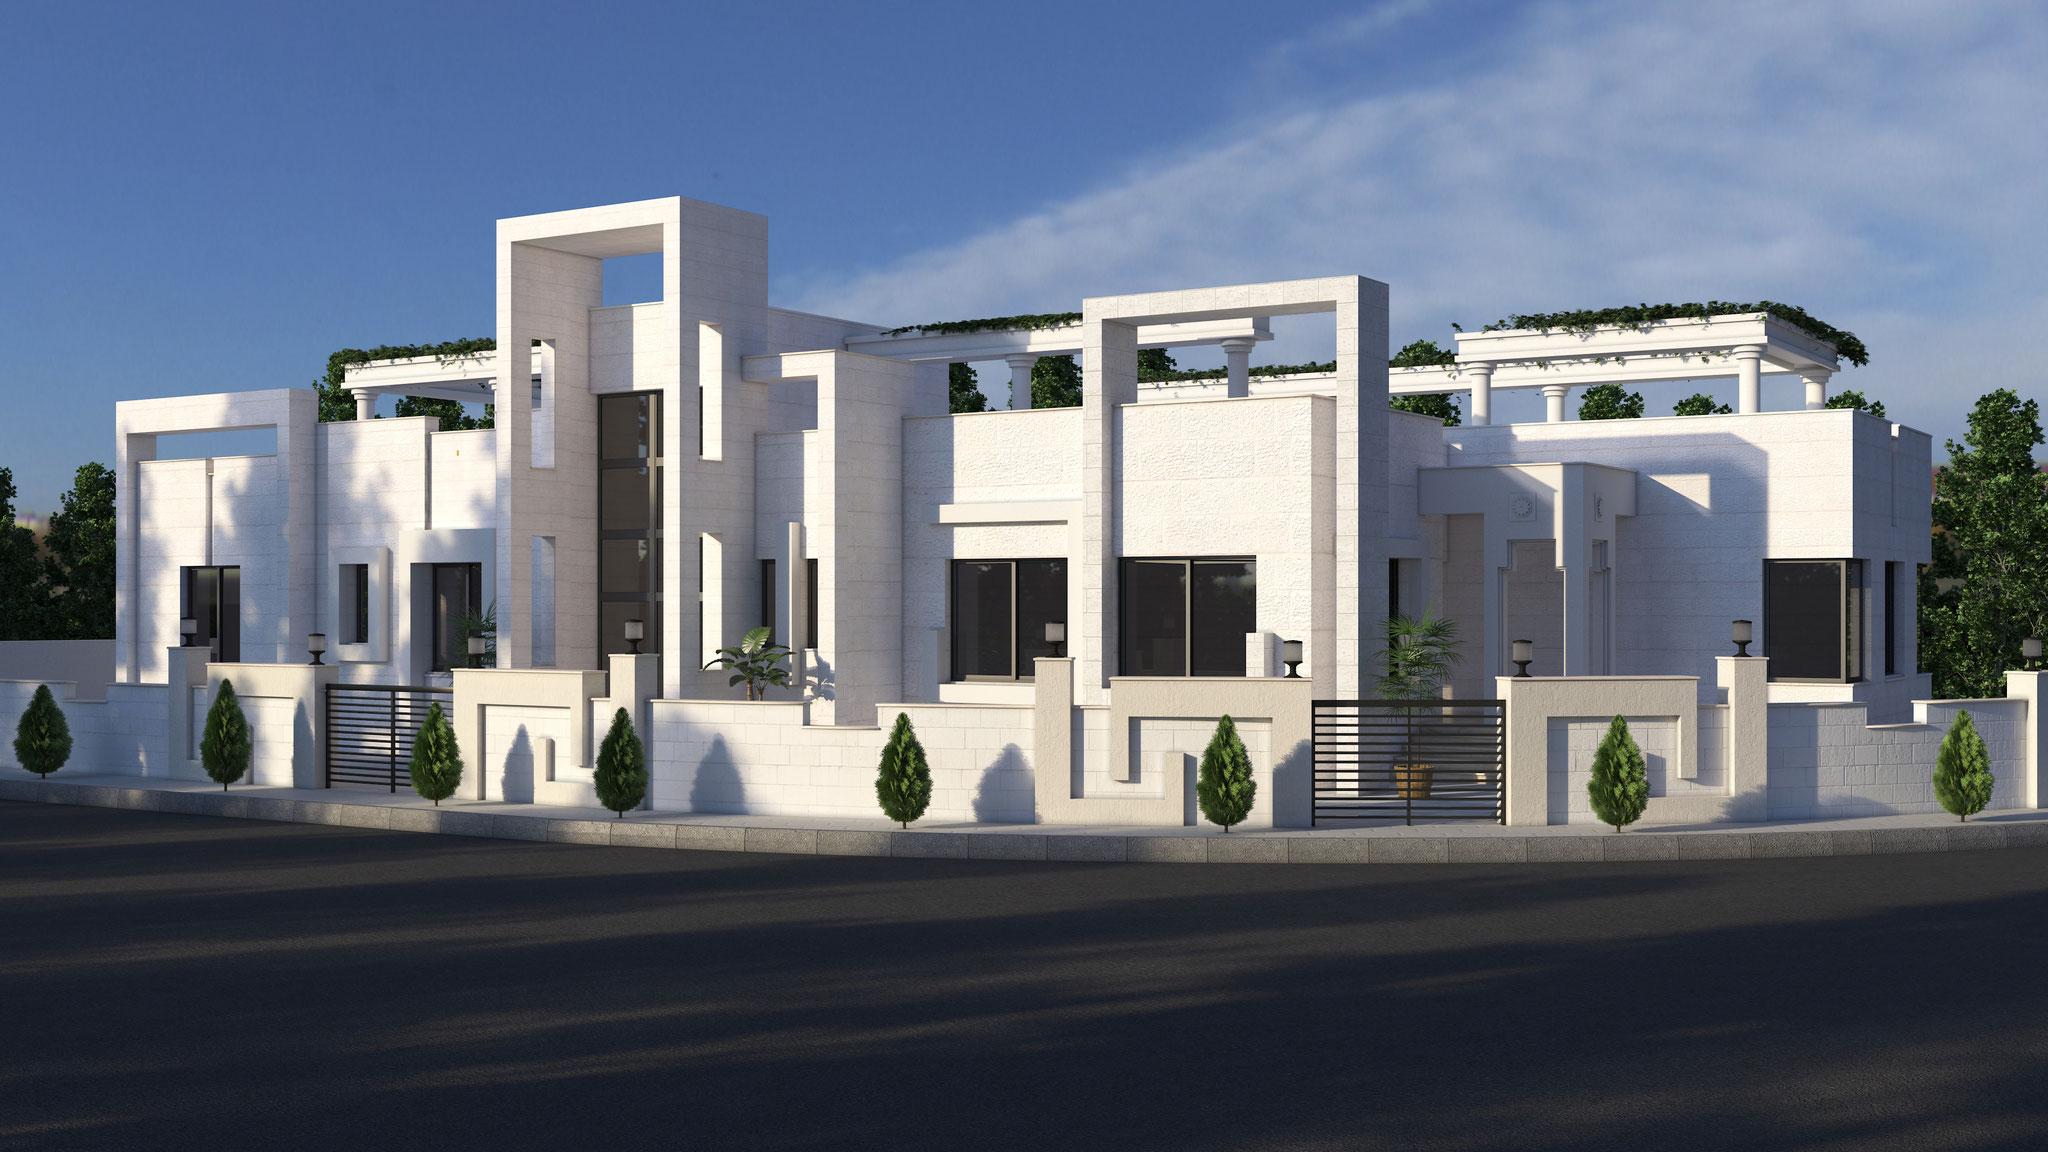 Mr M. Amaierh Villa - Amman - Jordan